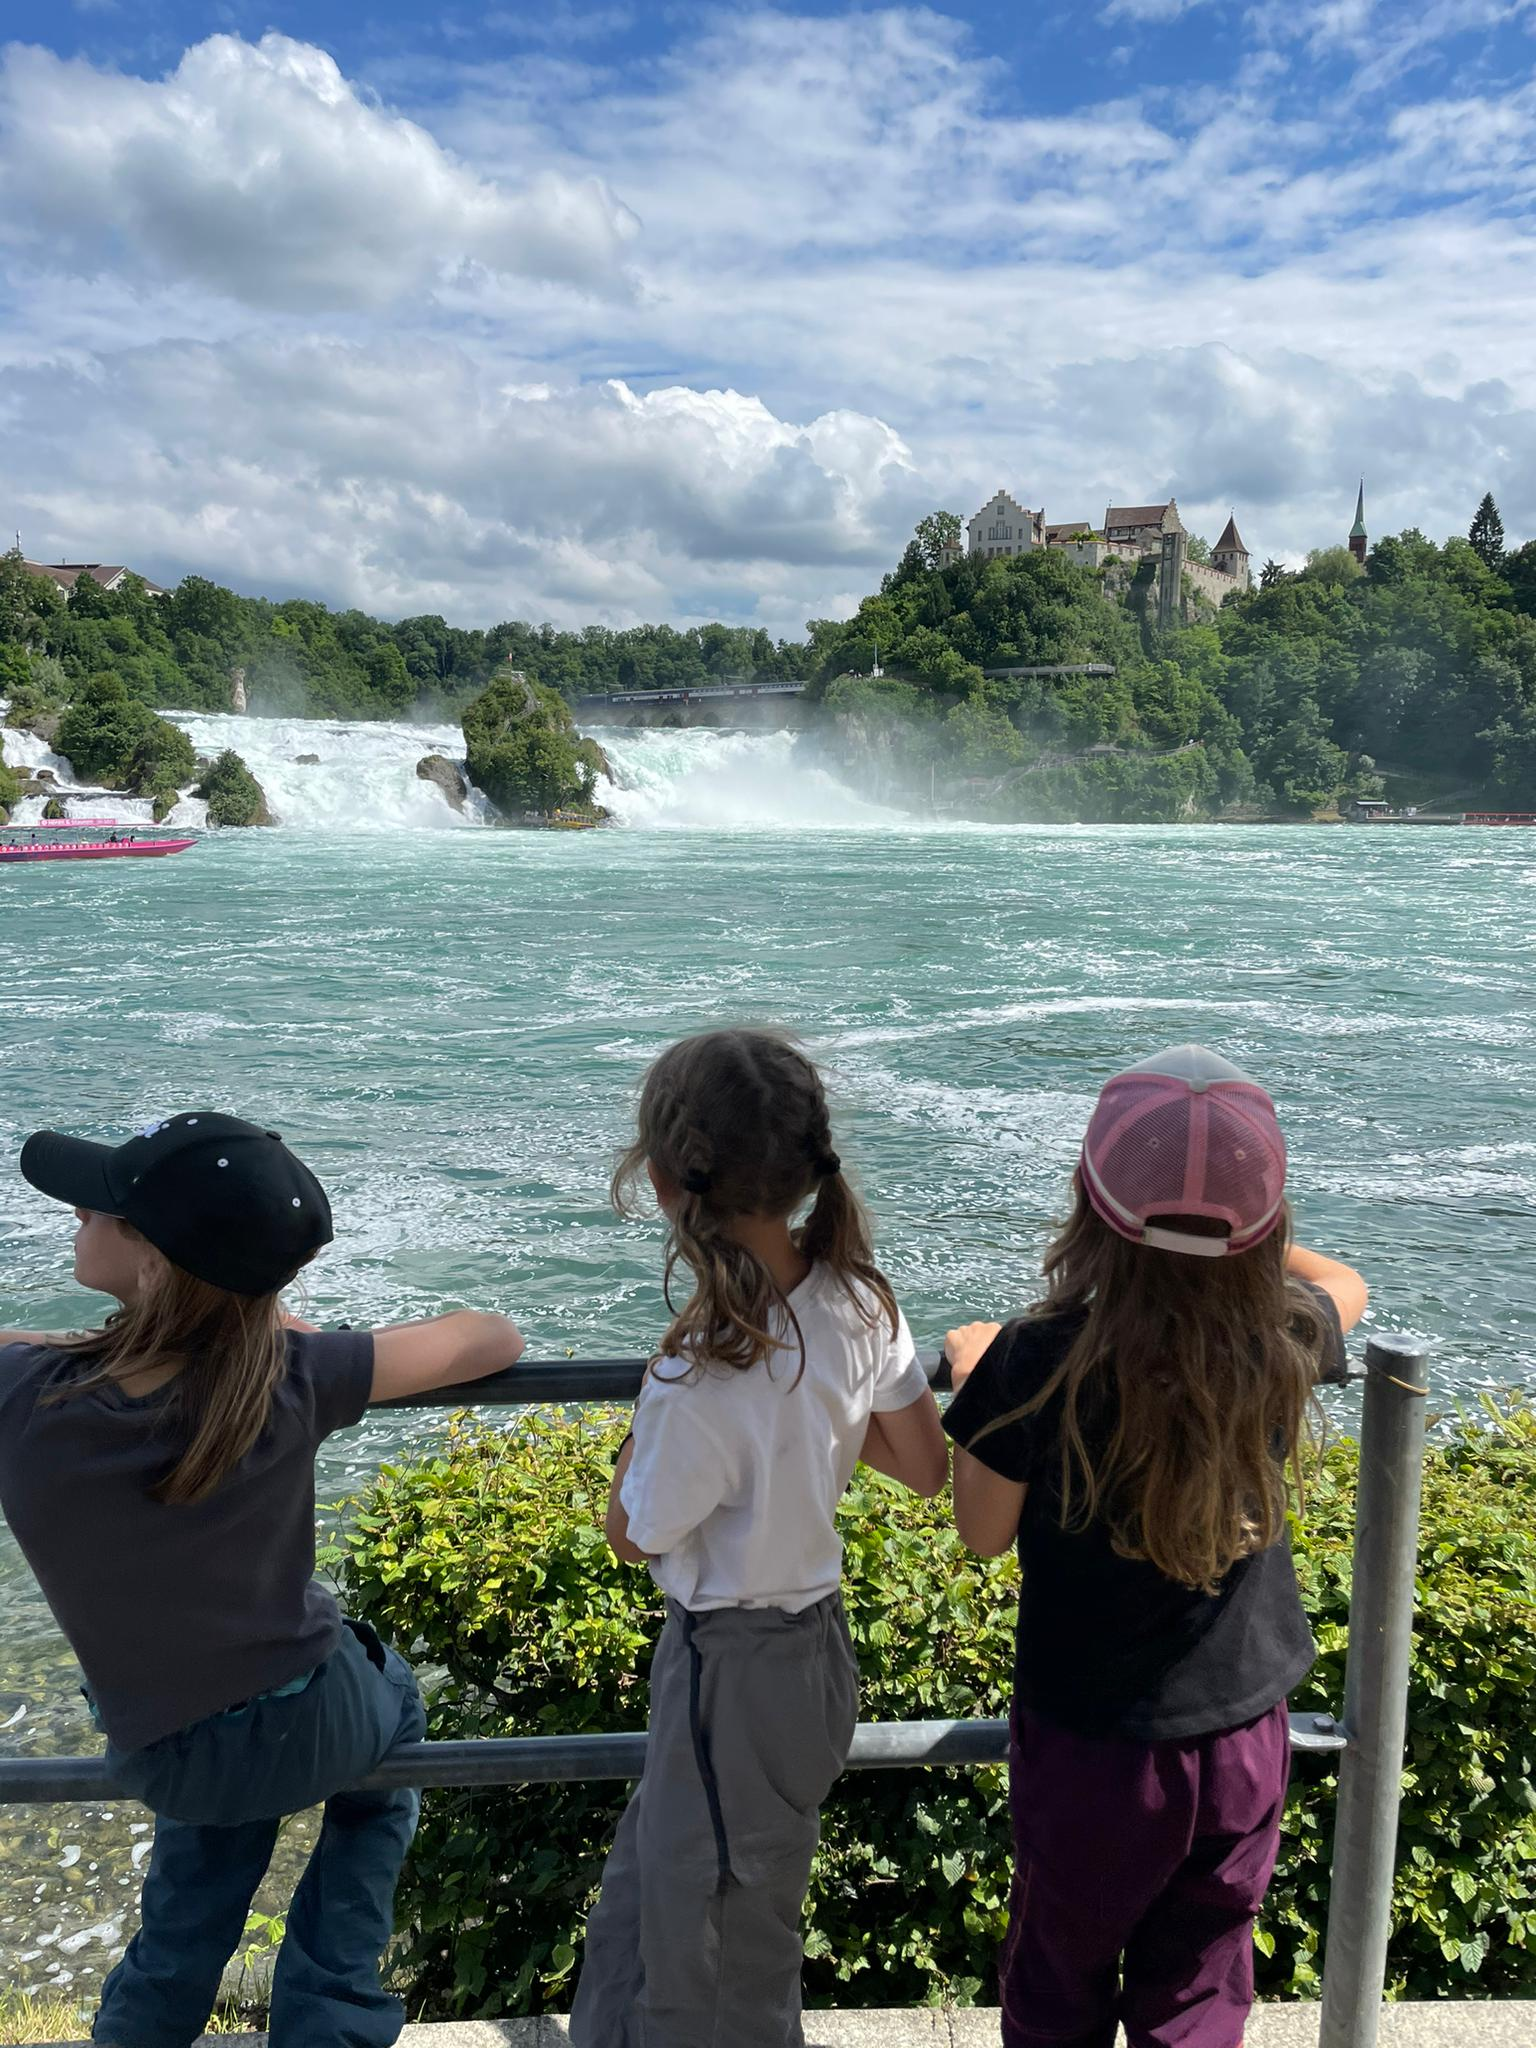 Voyage de la famille Cavadini: les chutes du Rhin